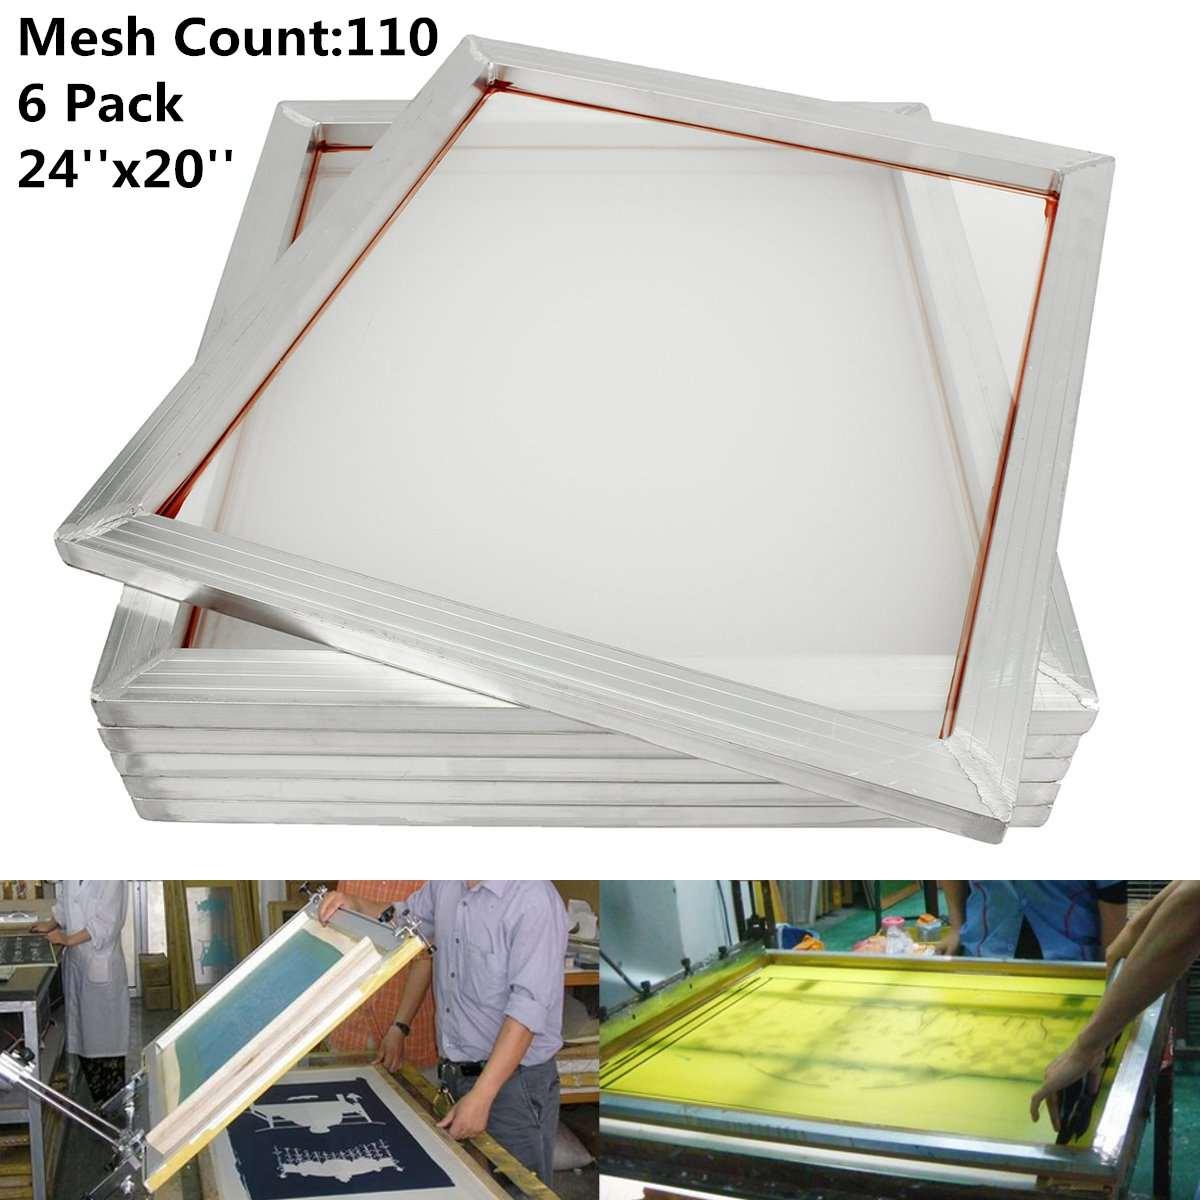 6Pcs Set 50X60cm Aluminum Silk Screen Printing Press Screen Frame 110 Mesh Count For High-precision Printed Circuit Boards